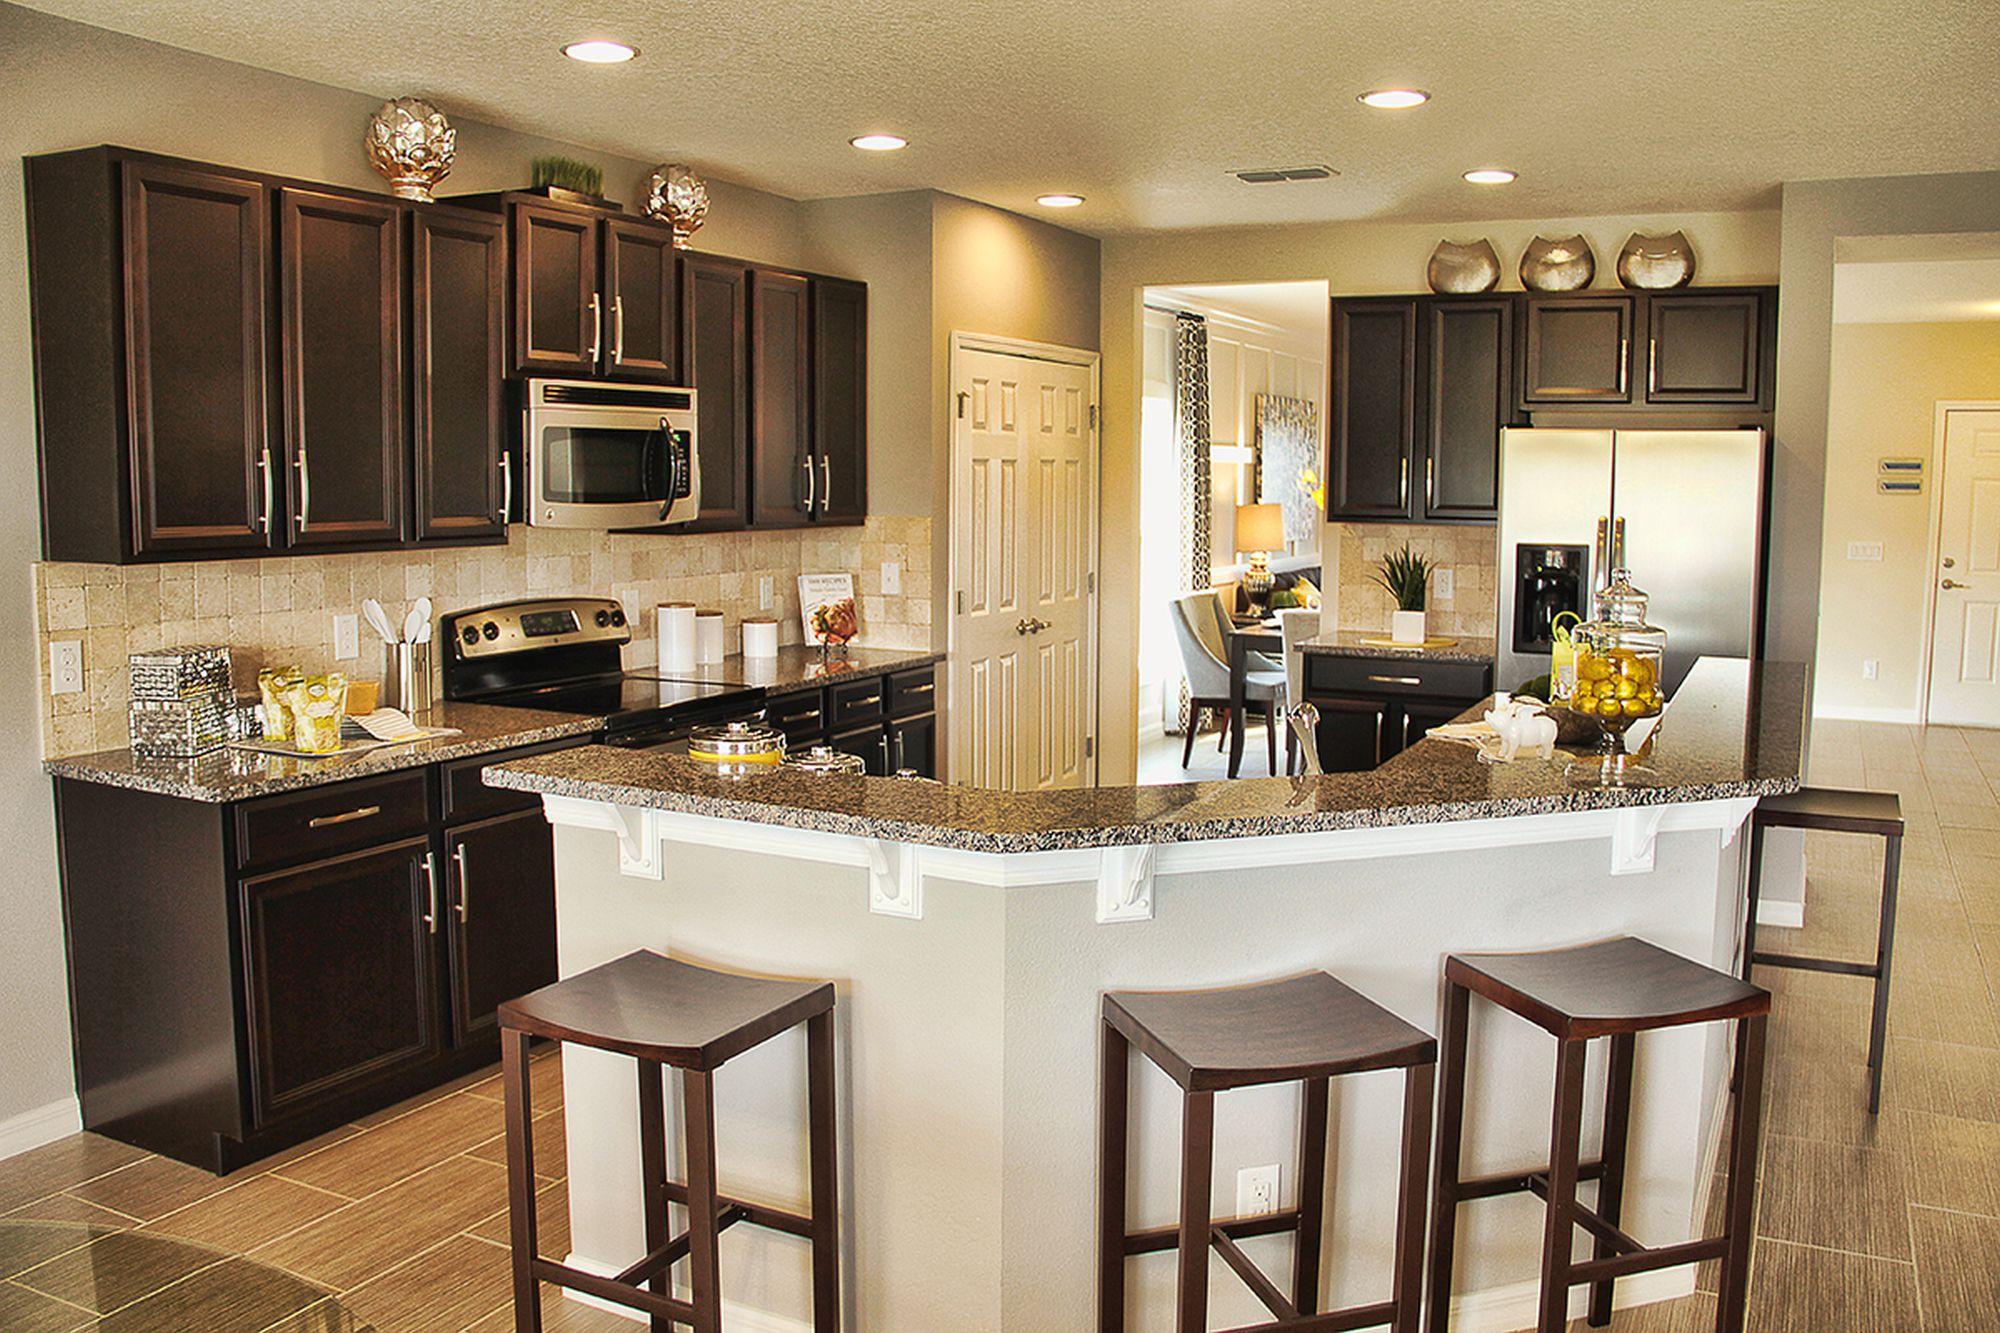 Westmorly kitchen Marbella Resort Davenport, Florida